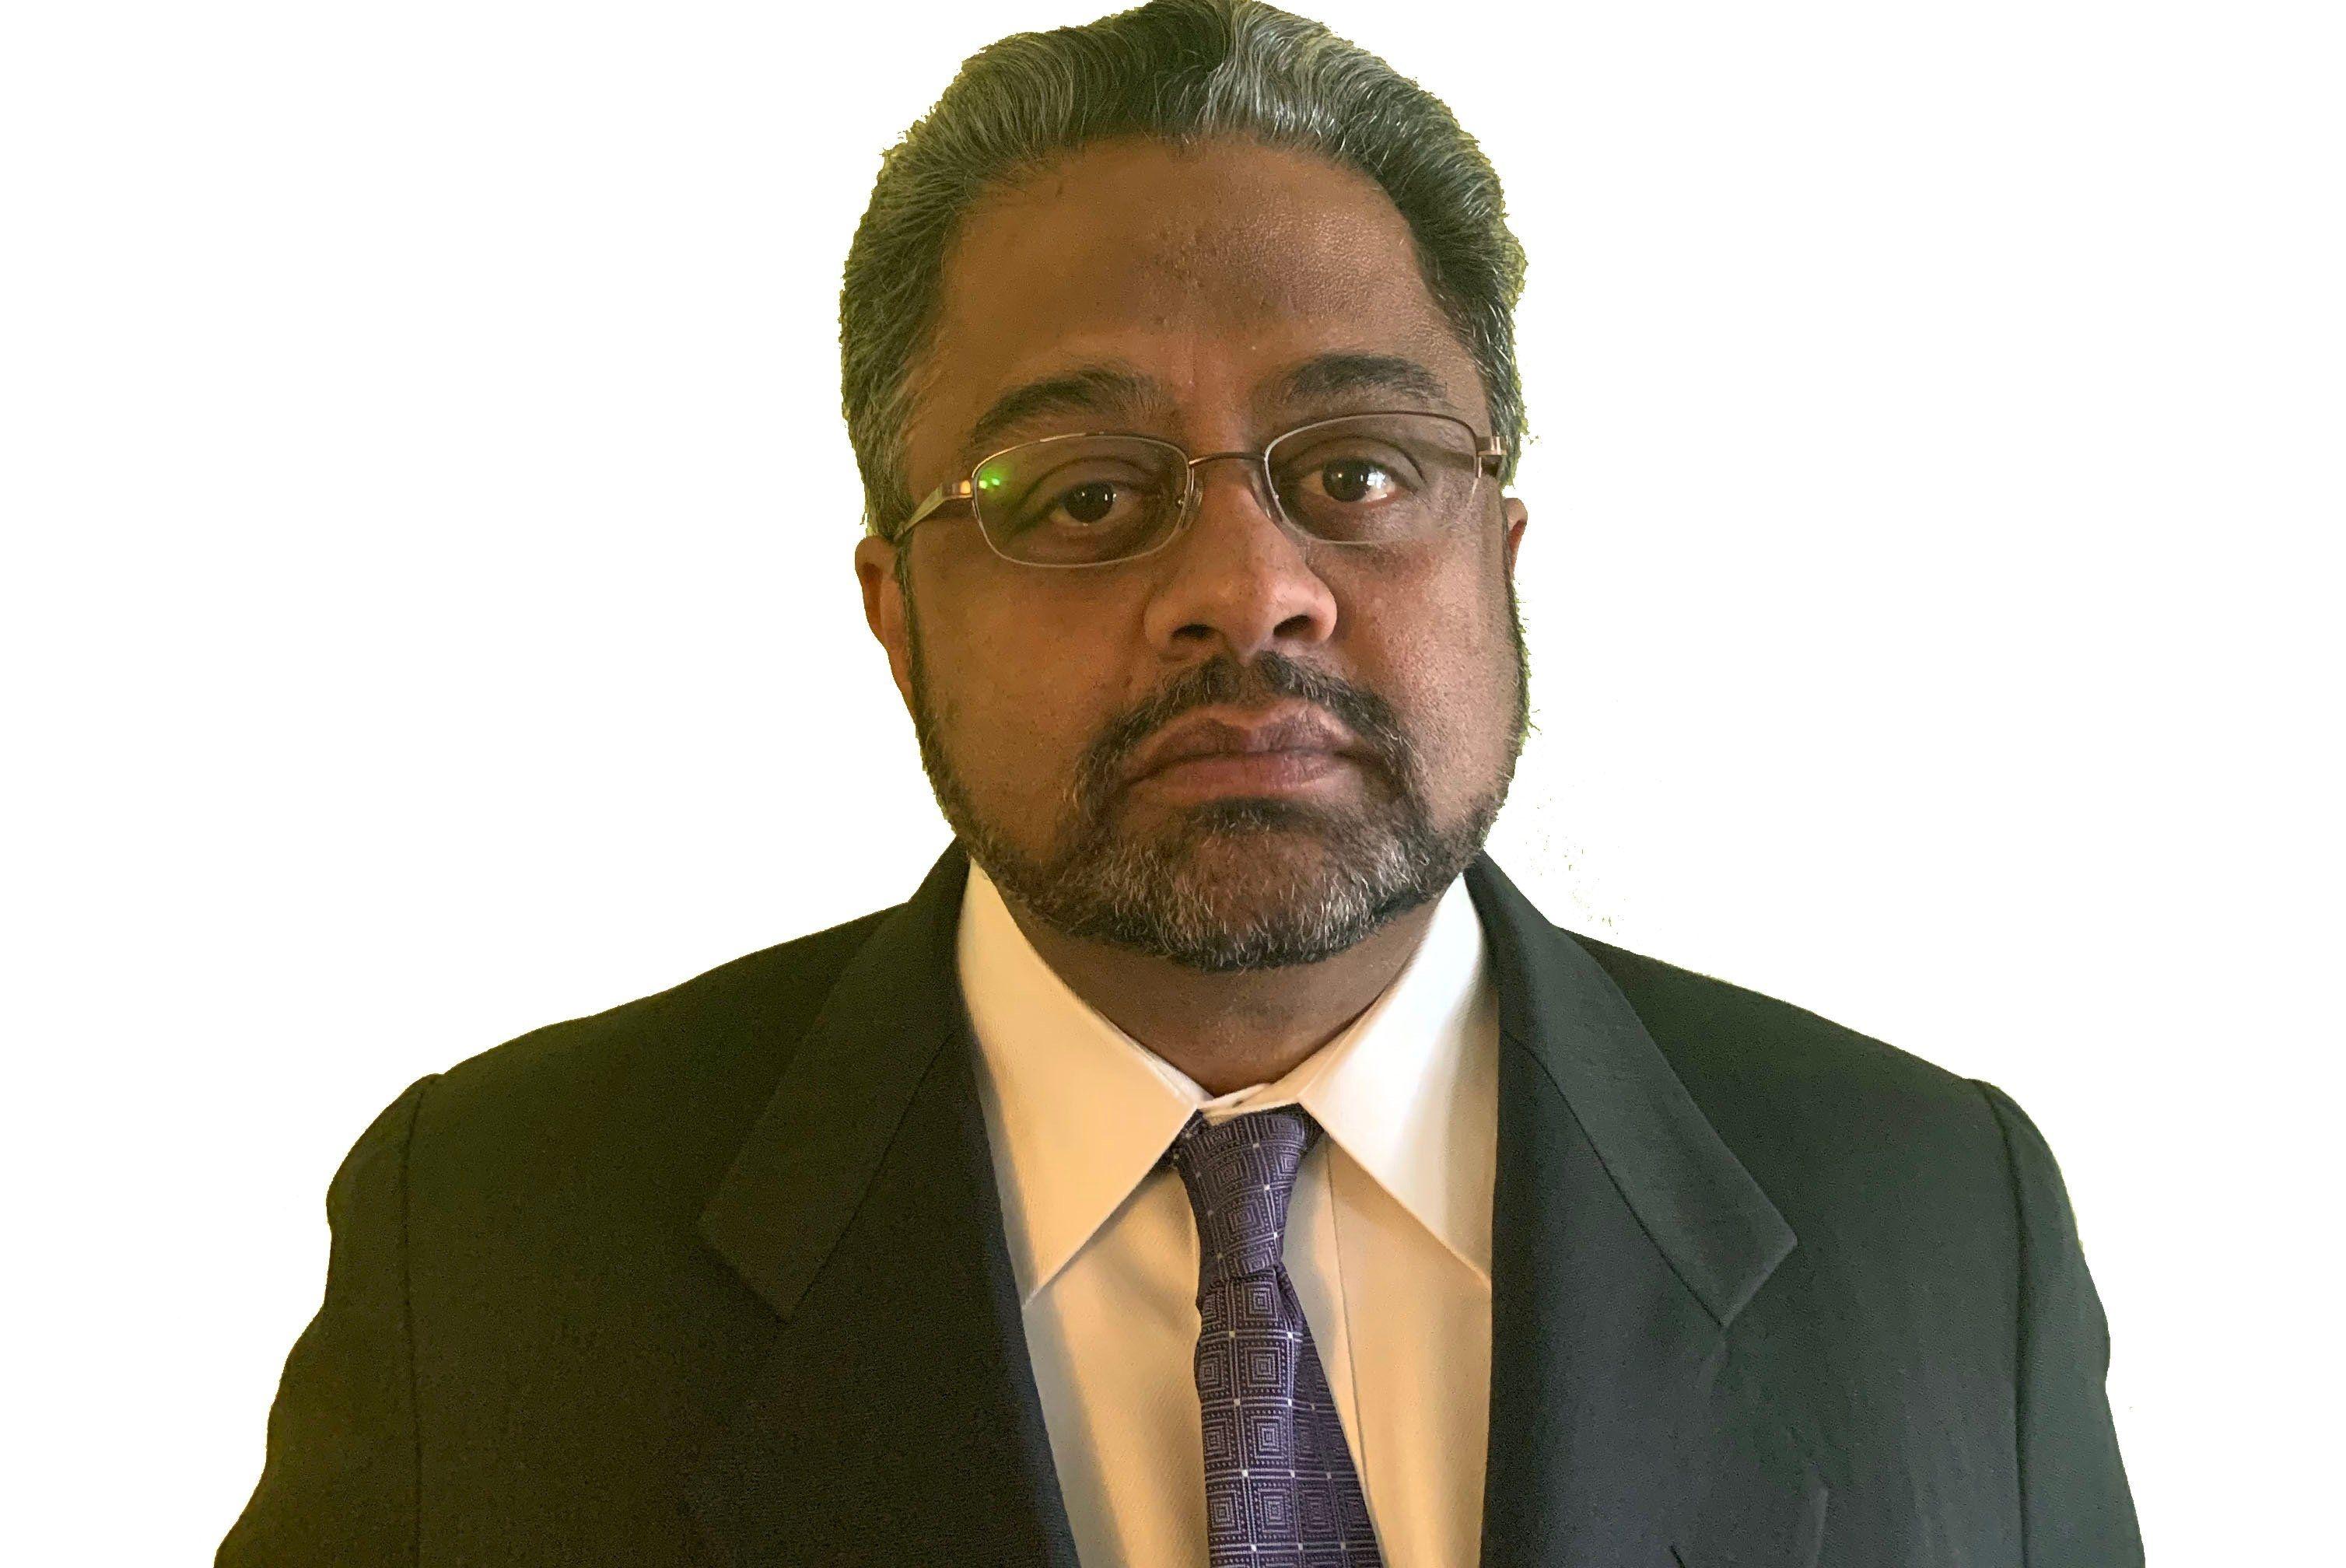 3 Questions: Balakrishnan Rajagopal on recognizing homelessness as a human rights violation